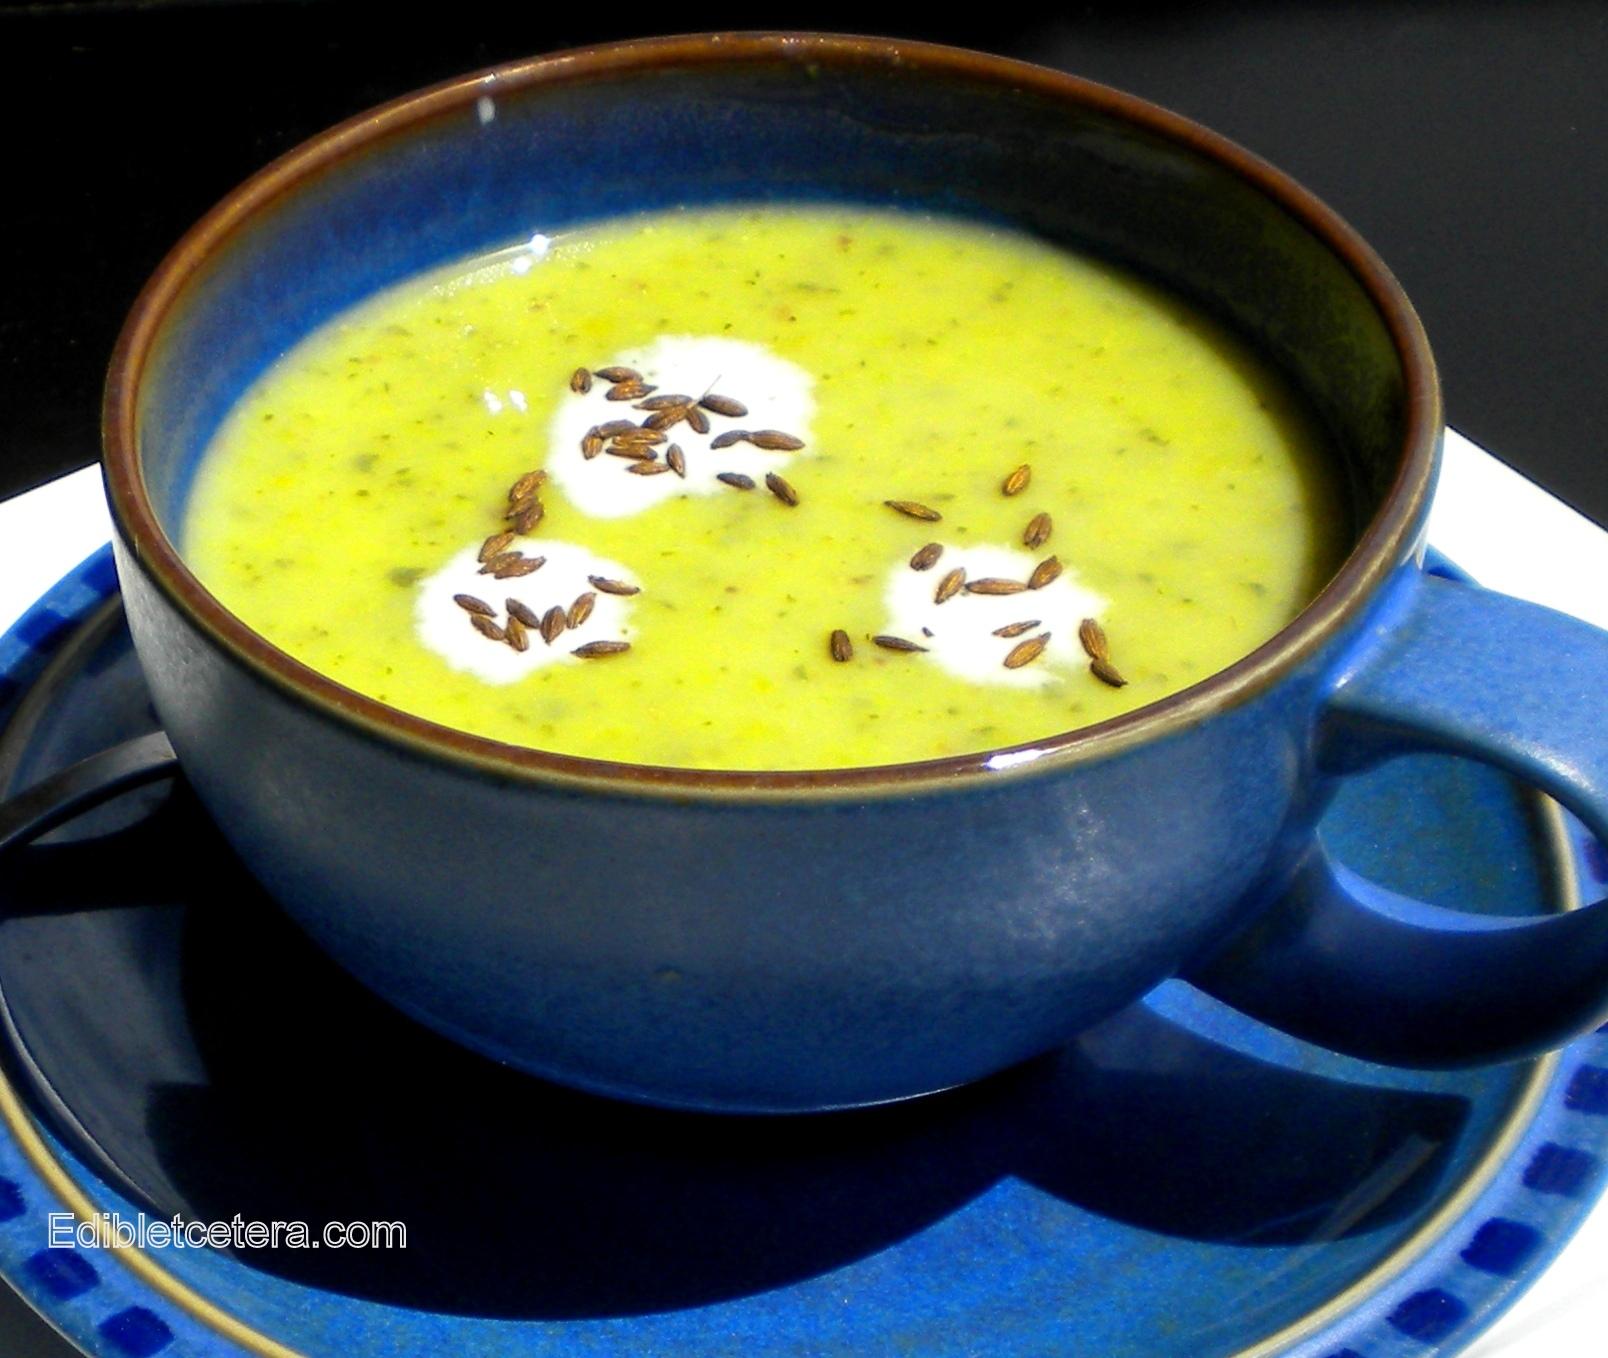 Recipe – Hummus with Sun-Dried Tomatoes & Kale | Edibletcetera ...